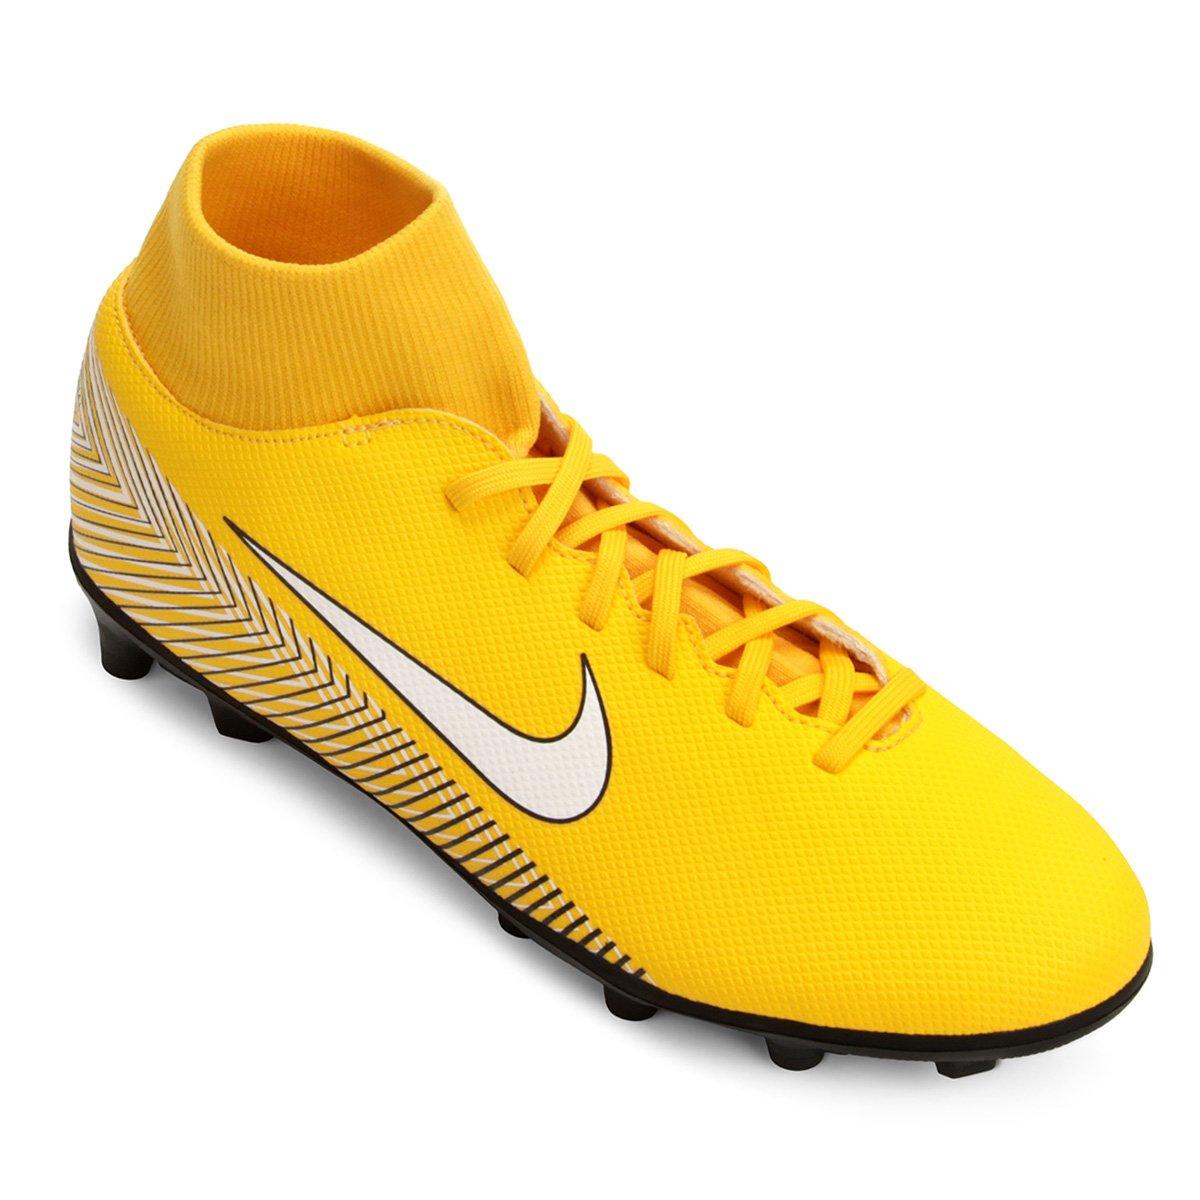 855940b1ce Chuteira Campo Nike Mercurial Superfly 6 Club Neymar FG